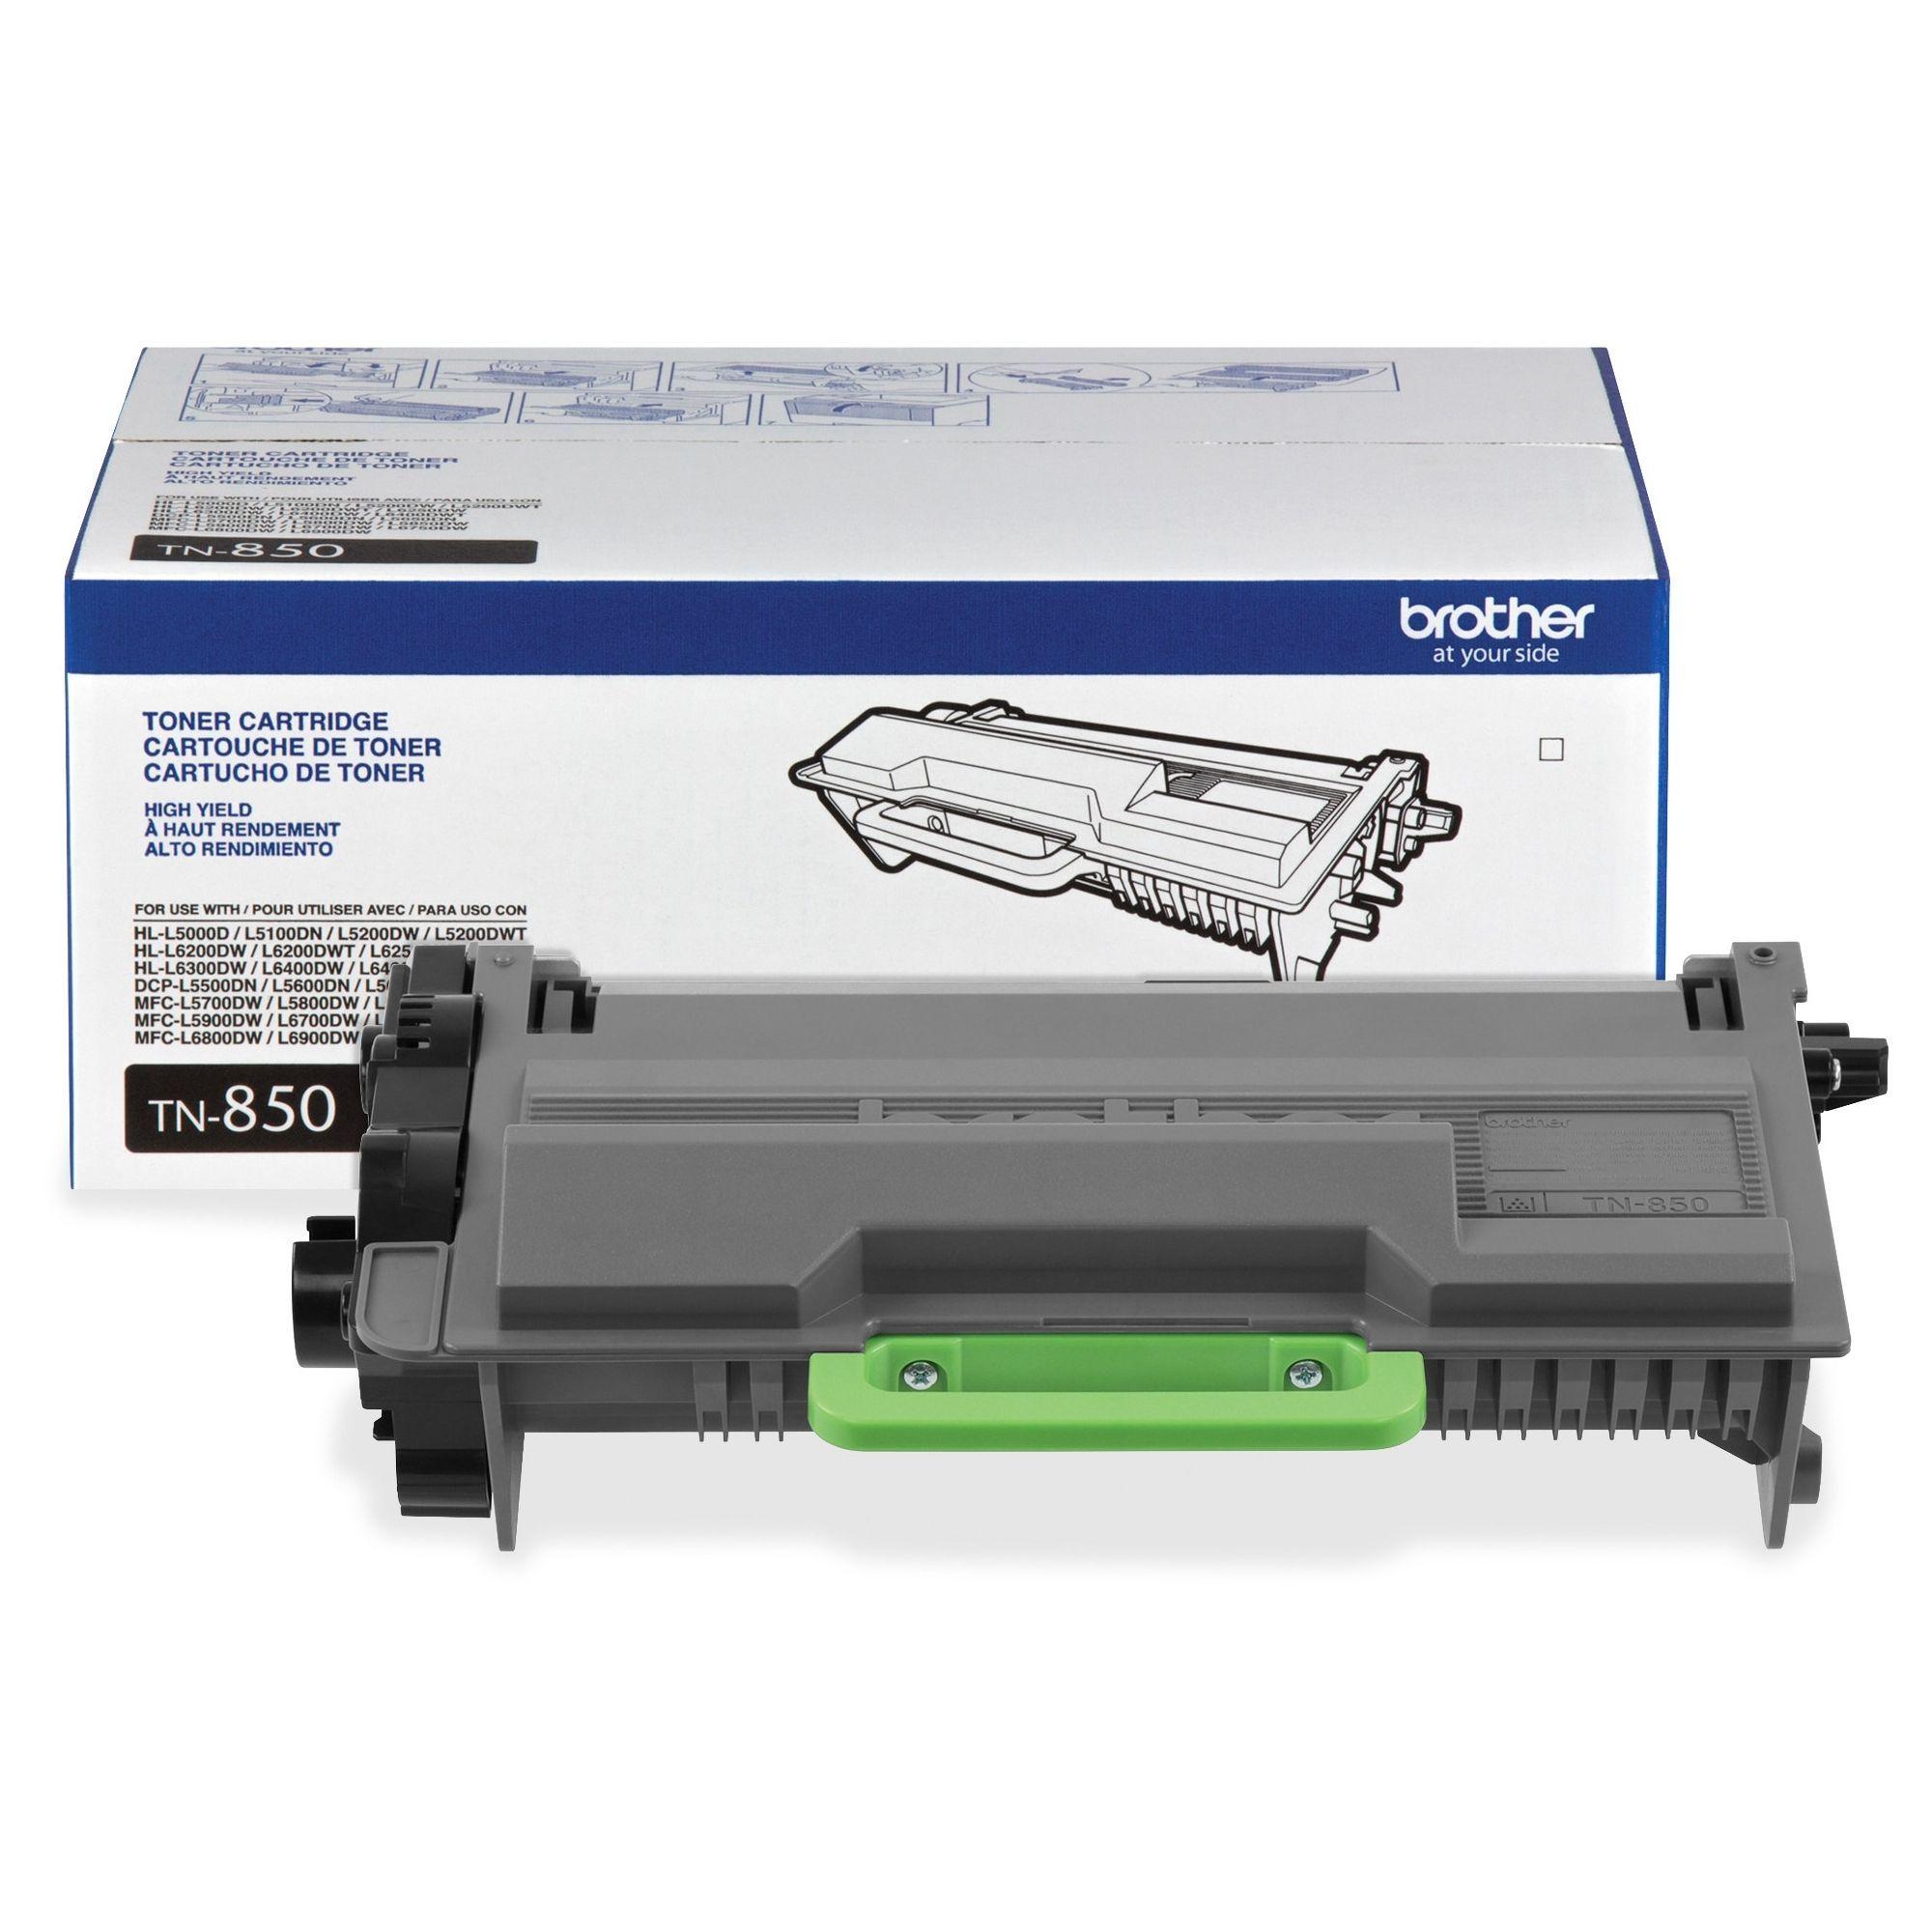 8000 Page Black Brother Tn850 Toner Cartridge Oem High Yield Laser